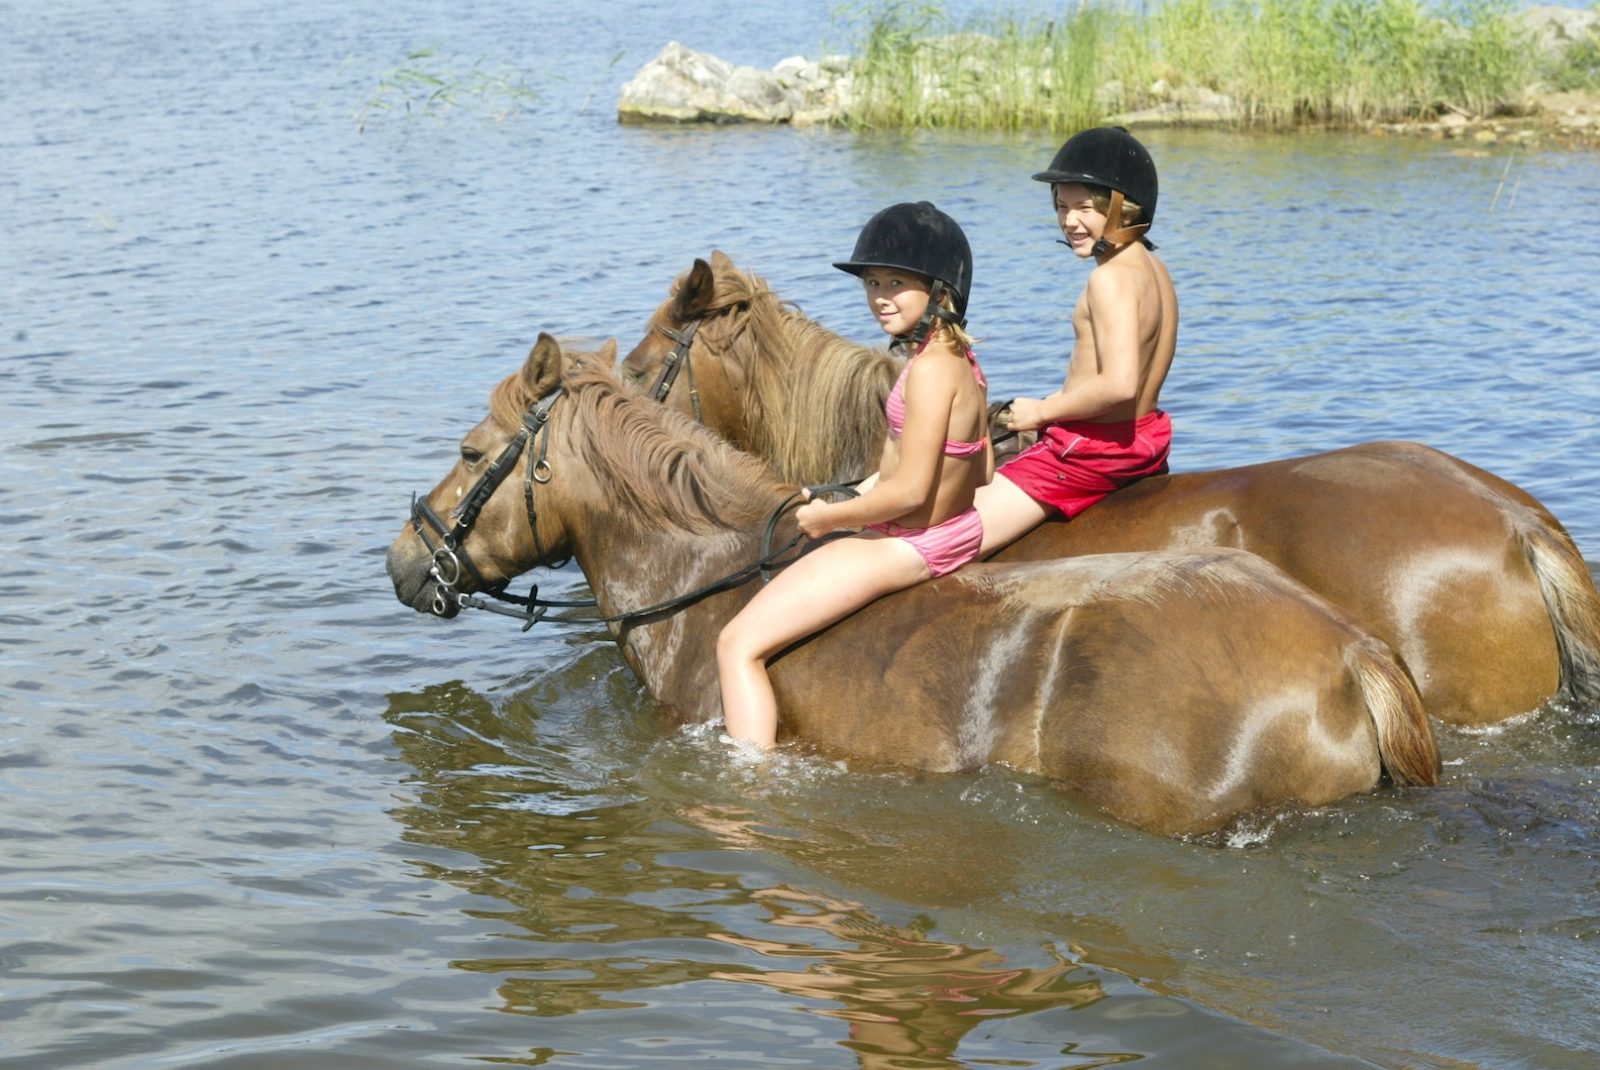 Riding trip with trustworthy Finnish horses